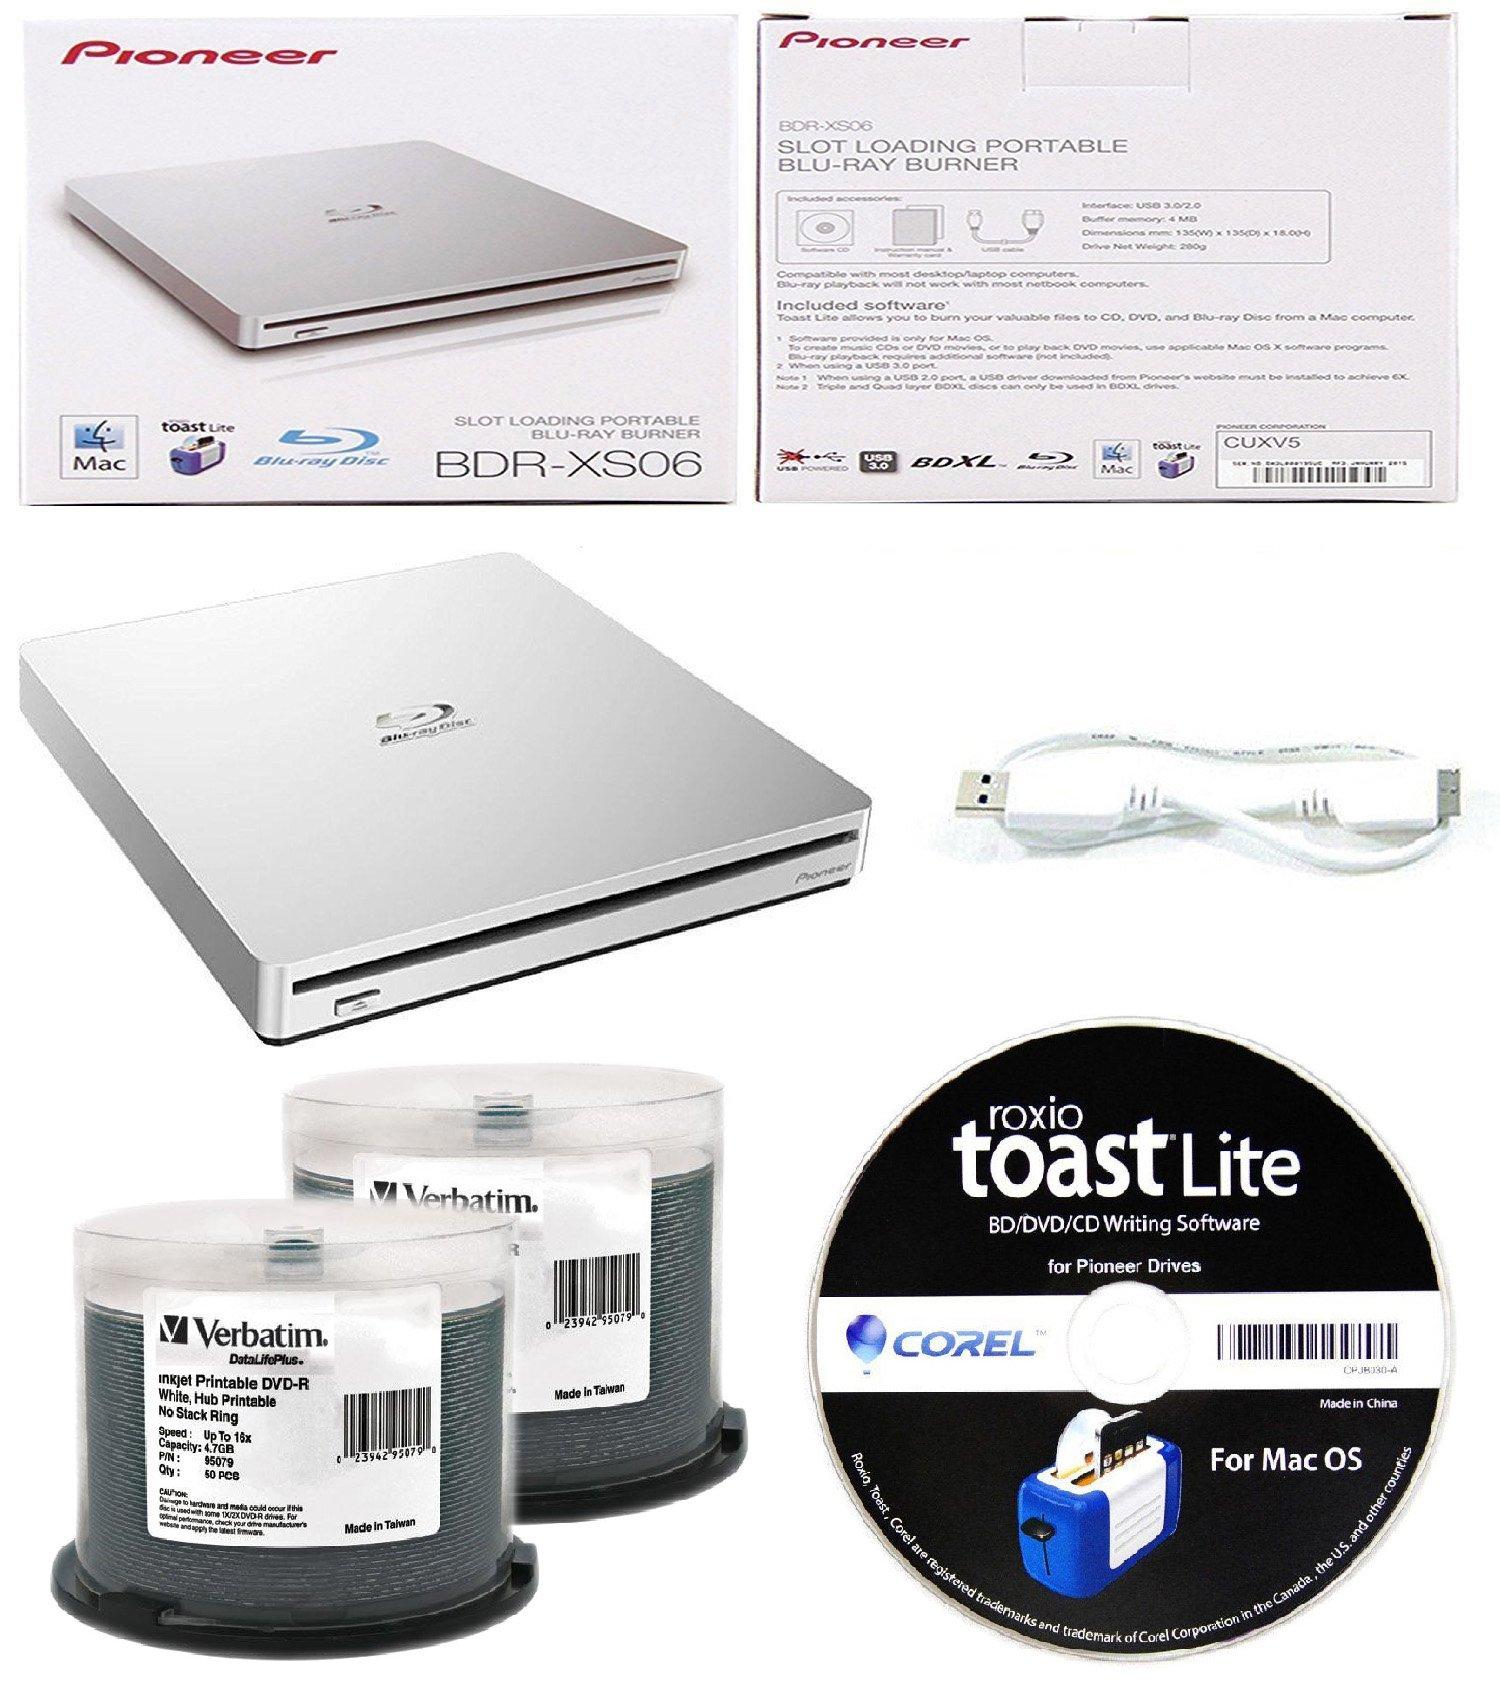 Pioneer 6x BDR-XS06 Slim Slot Portable External Blu-ray BDXL Burner, Roxio Toast Lite Software and USB Cable Bundle with 100pk DVD-R Verbatim 4.7GB 16X DataLifePlus White Inkjet, Hub Printable